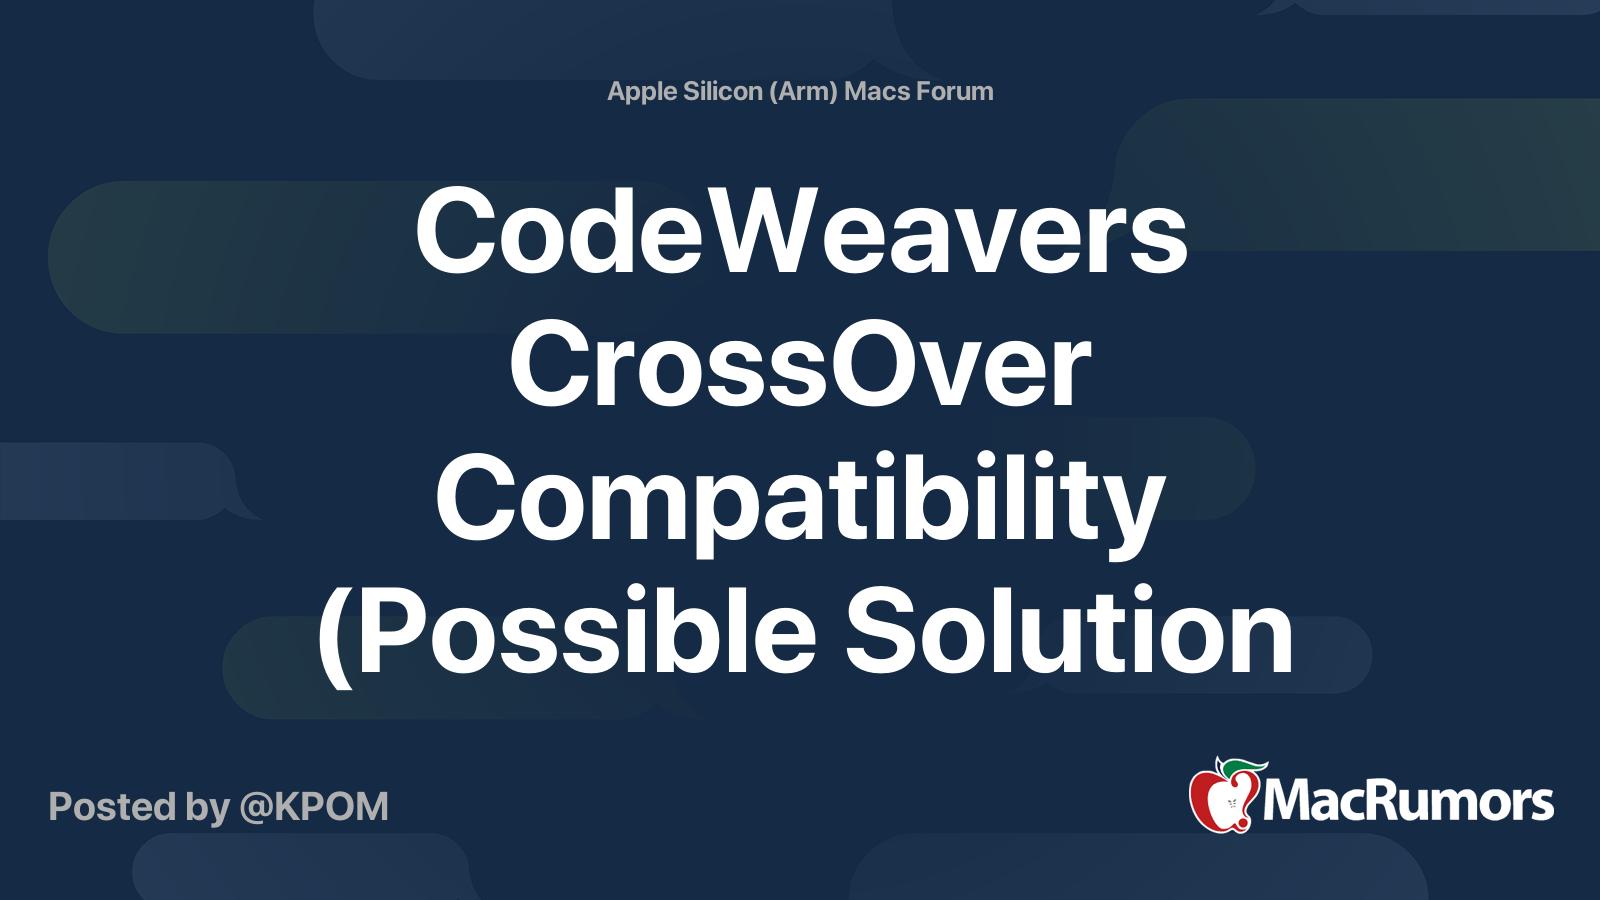 Codeweavers crossover download